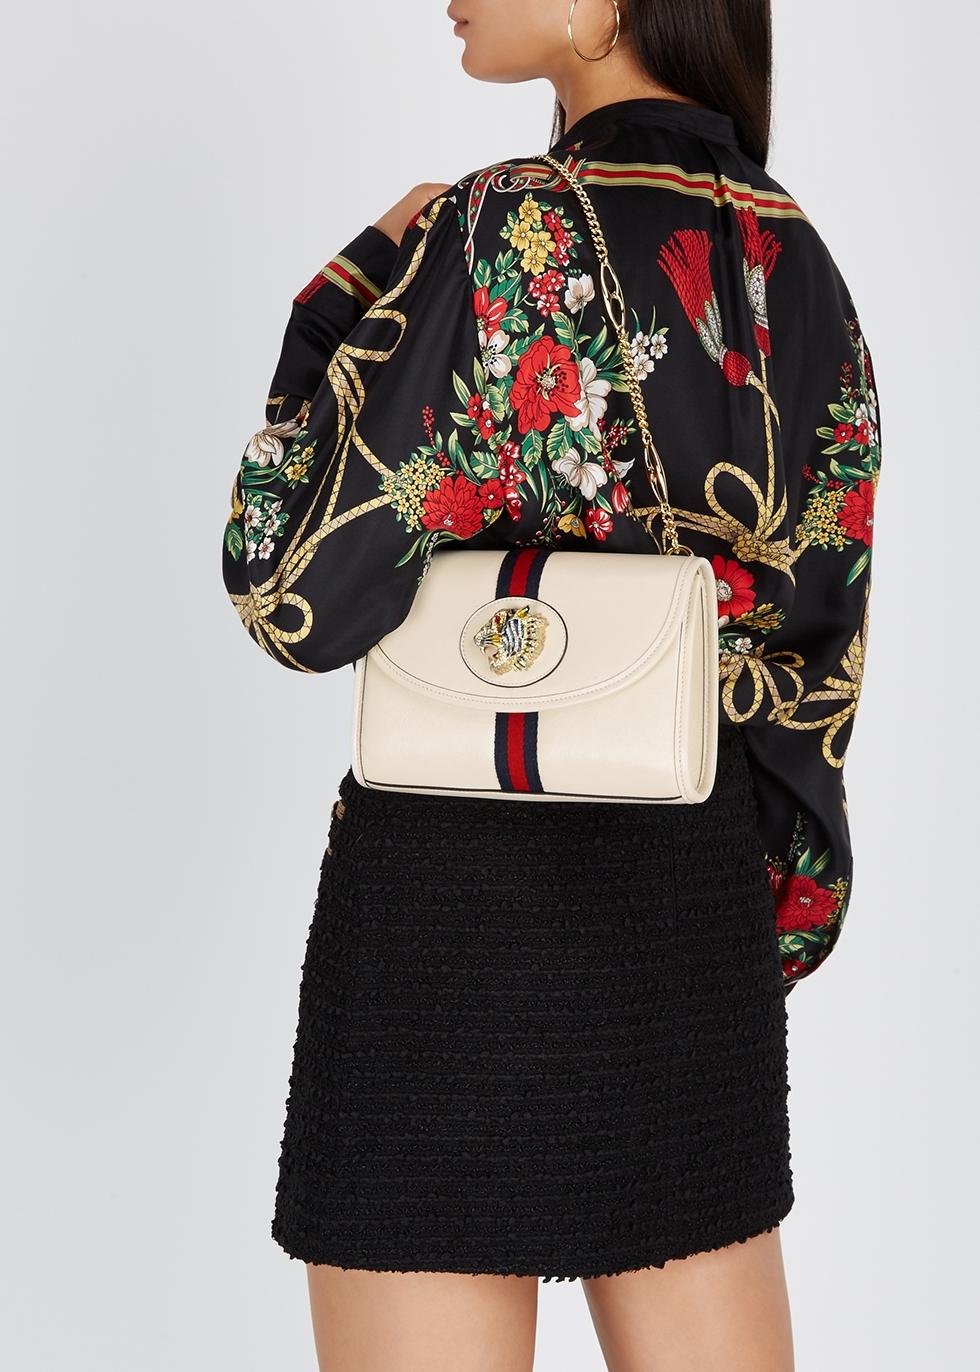 Rajah cream leather shoulder bag - Gucci